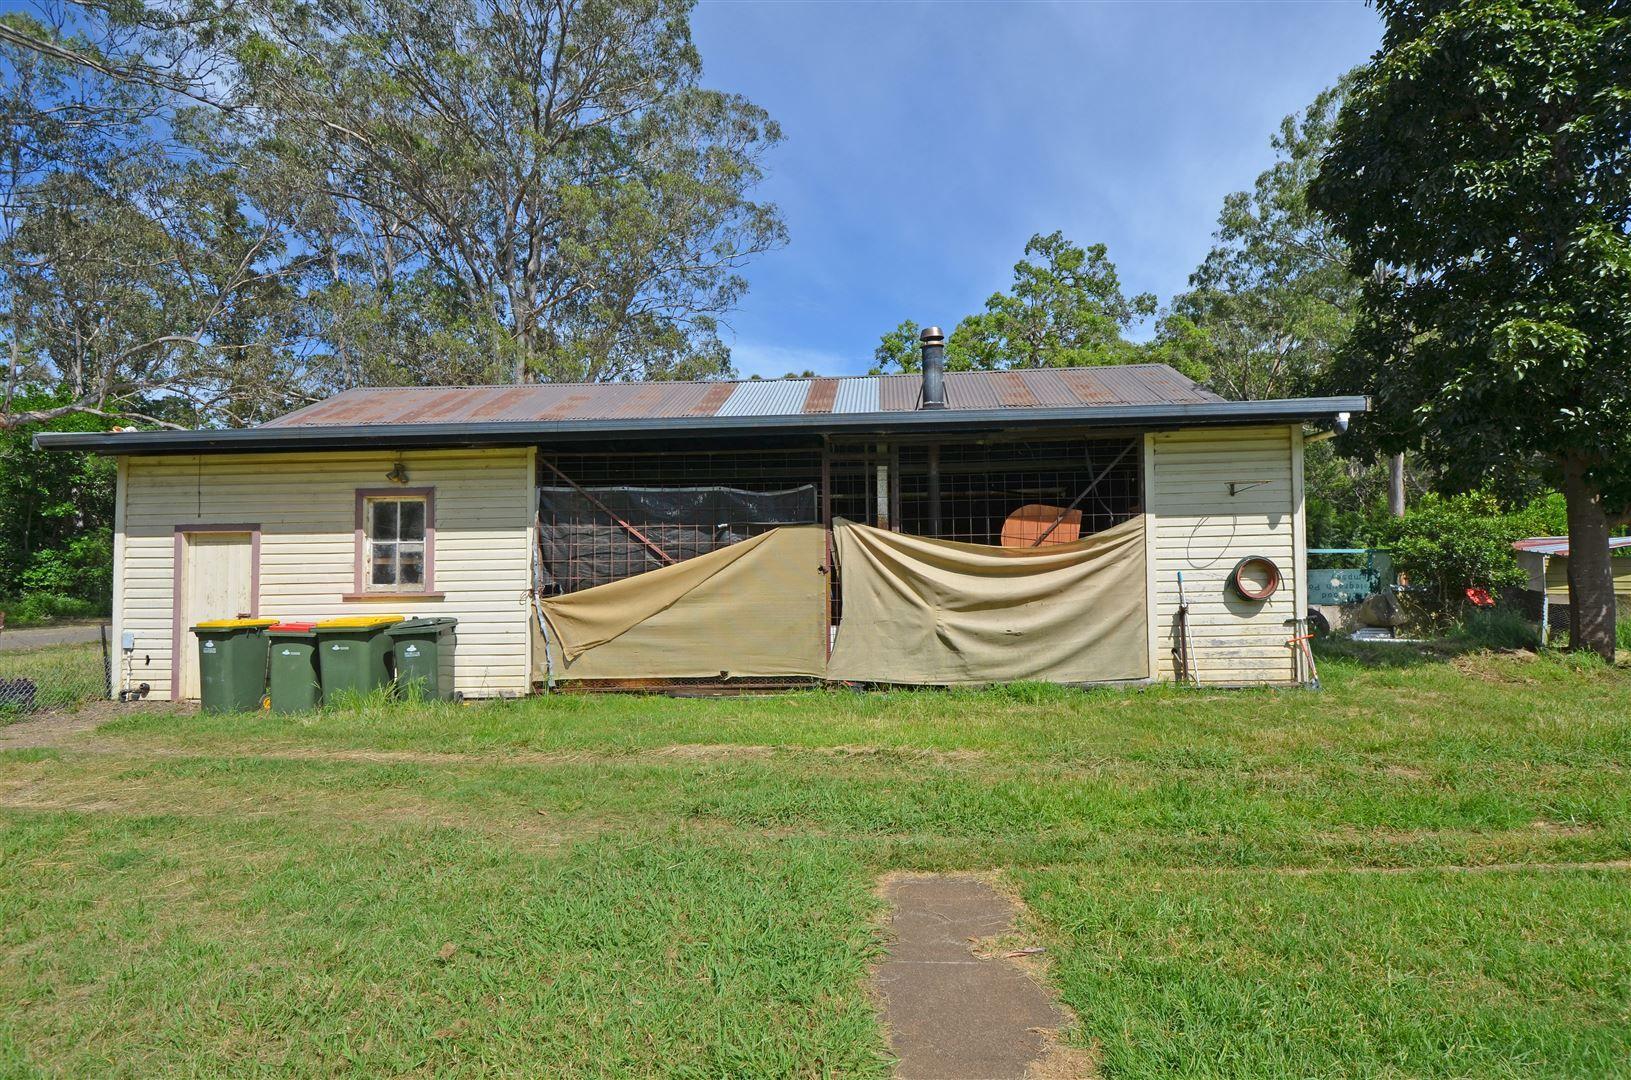 Lot1/DP758383 - 36 Main Street, Ellenborough NSW 2446, Image 2